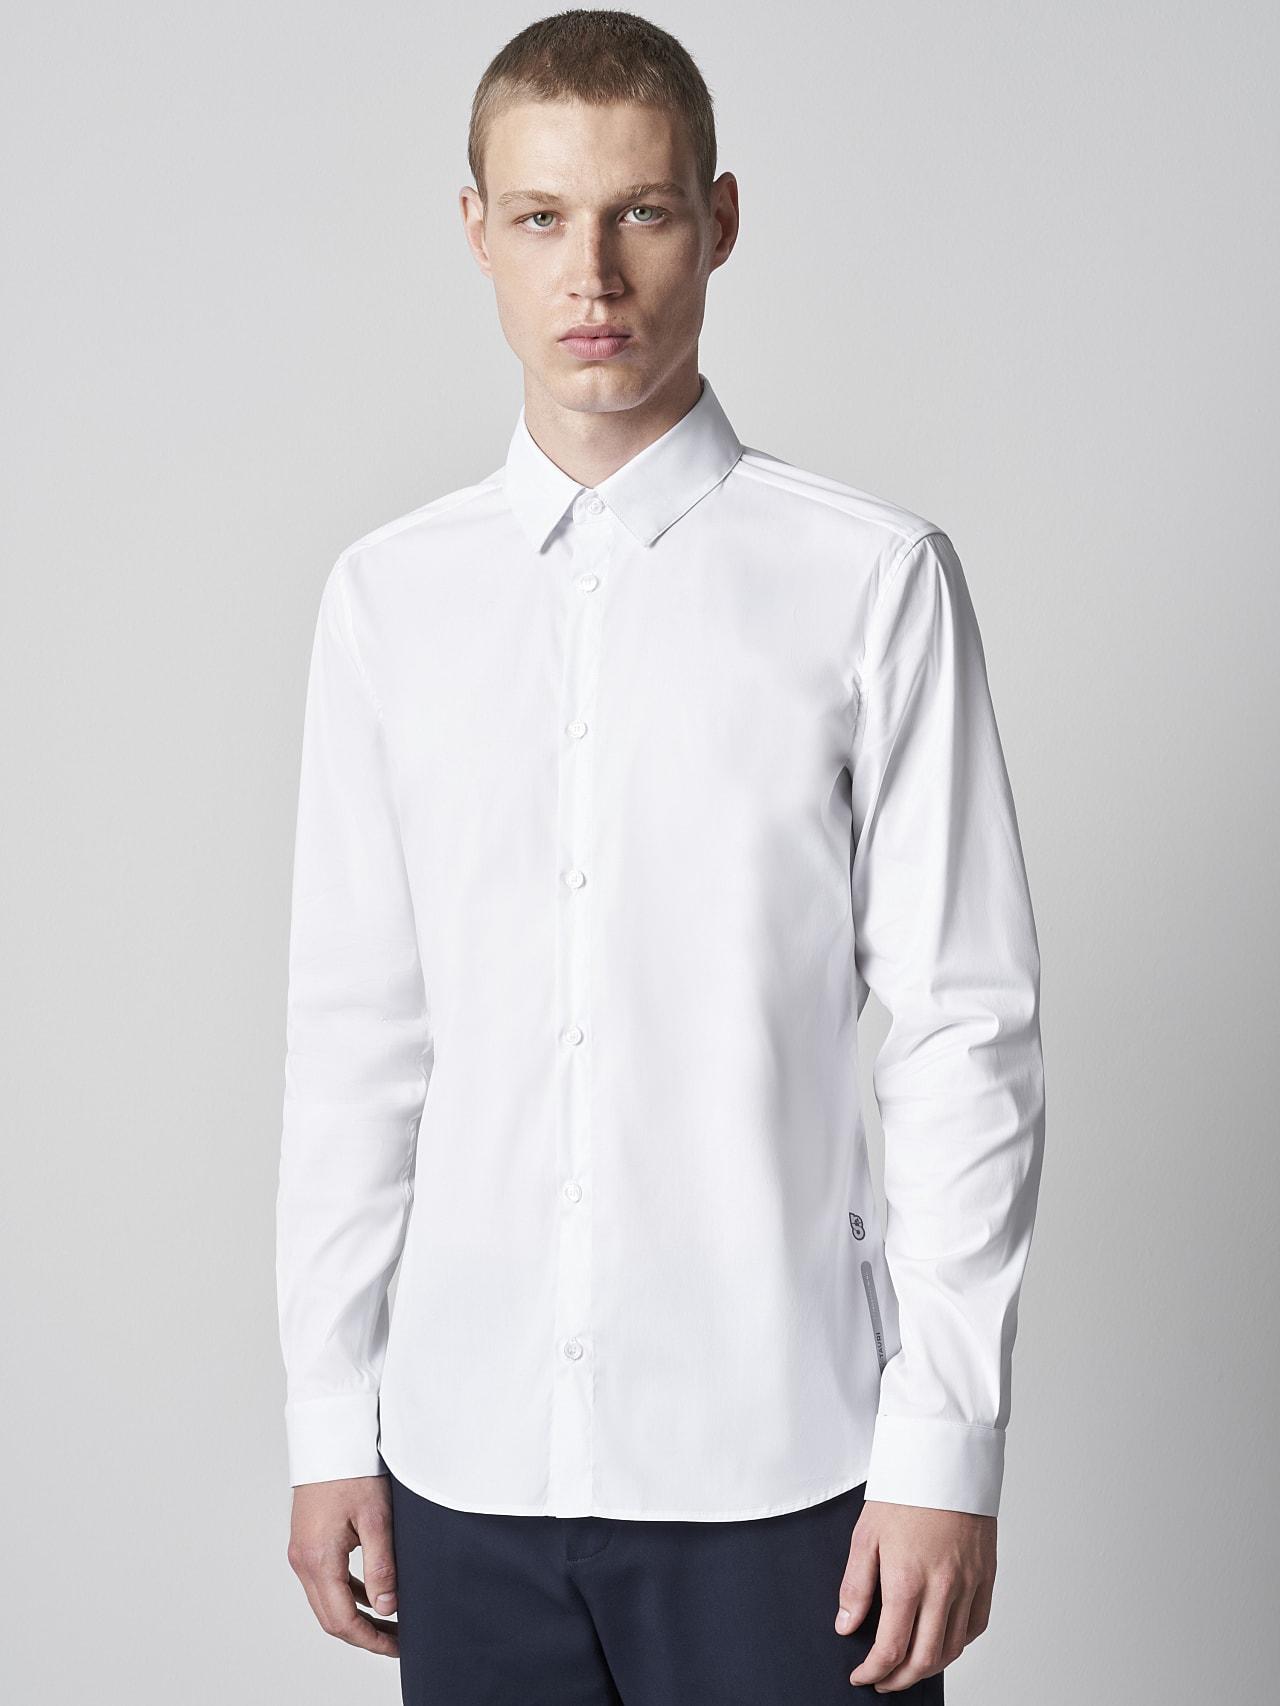 WAARG V2.Y5.02 Easy-Care Cotton Shirt white Model shot Alpha Tauri